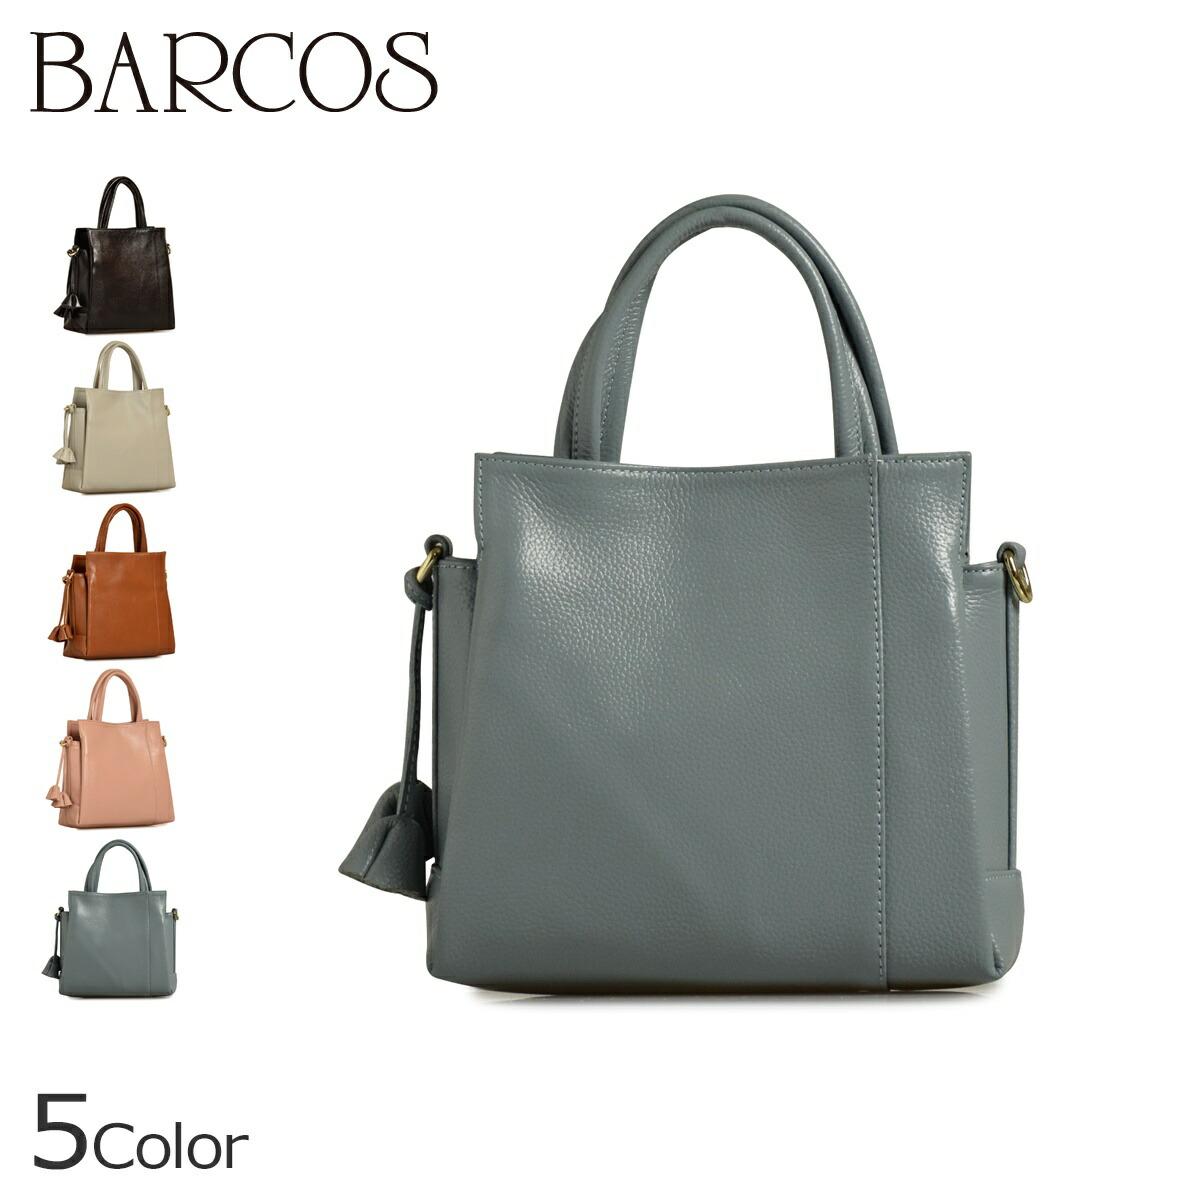 314d36f84464 バルコスBARCOSミニハンドバッグポケット付き2wayシュリンクレザー本革バッグ鞄カバン黒